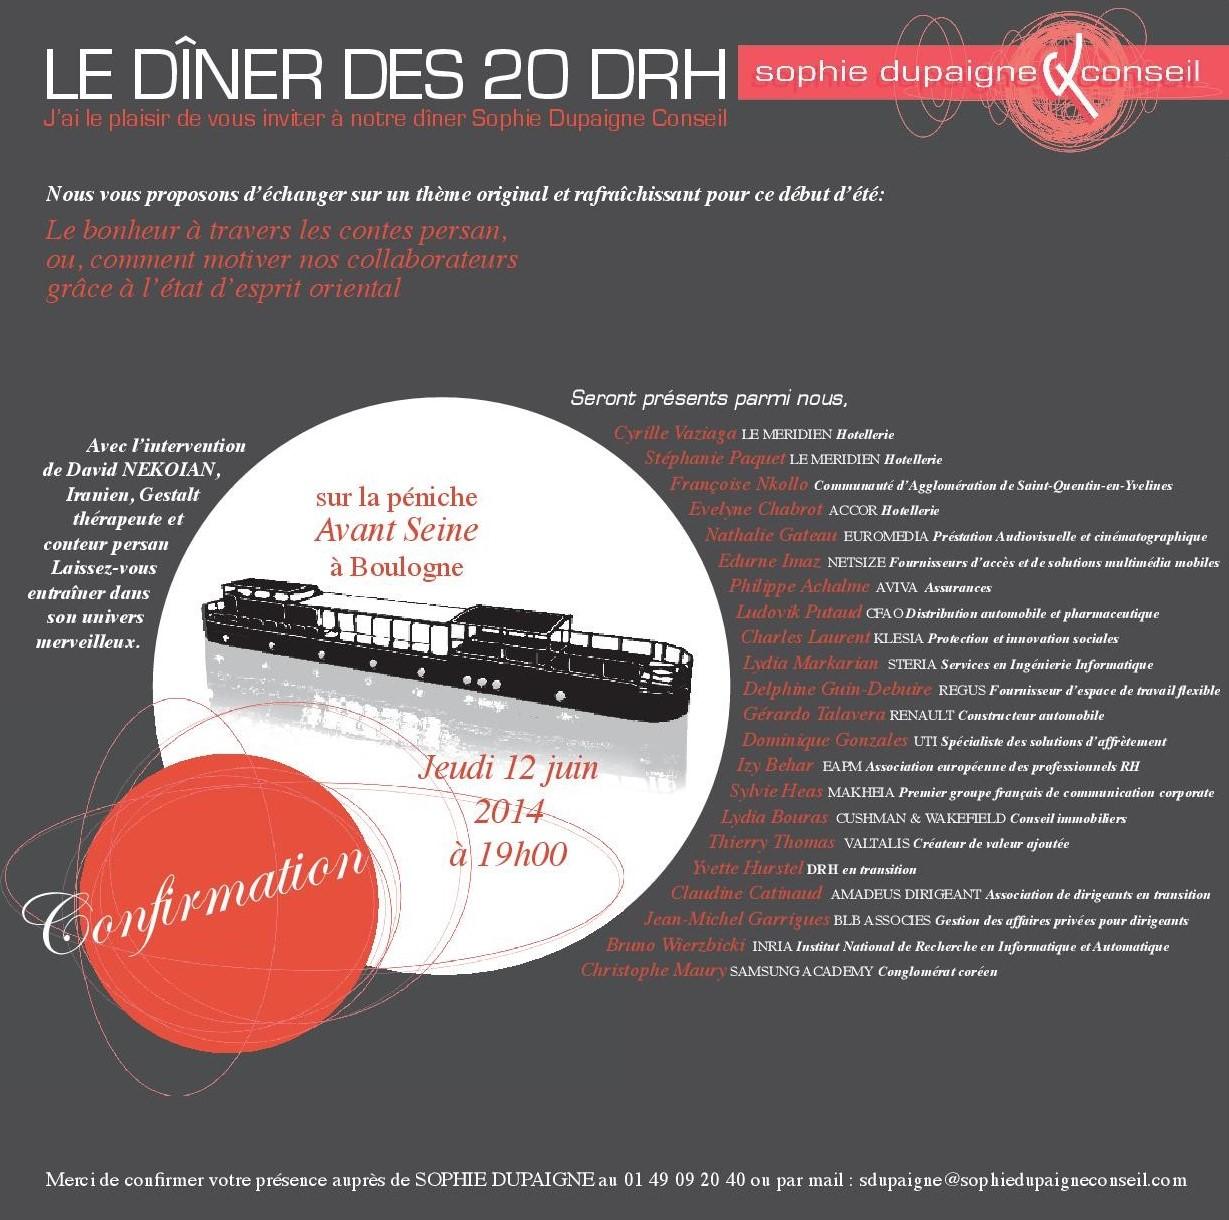 Le diner des 20 DRH juin 2014 https://davidnekoian.com/contes-persans/